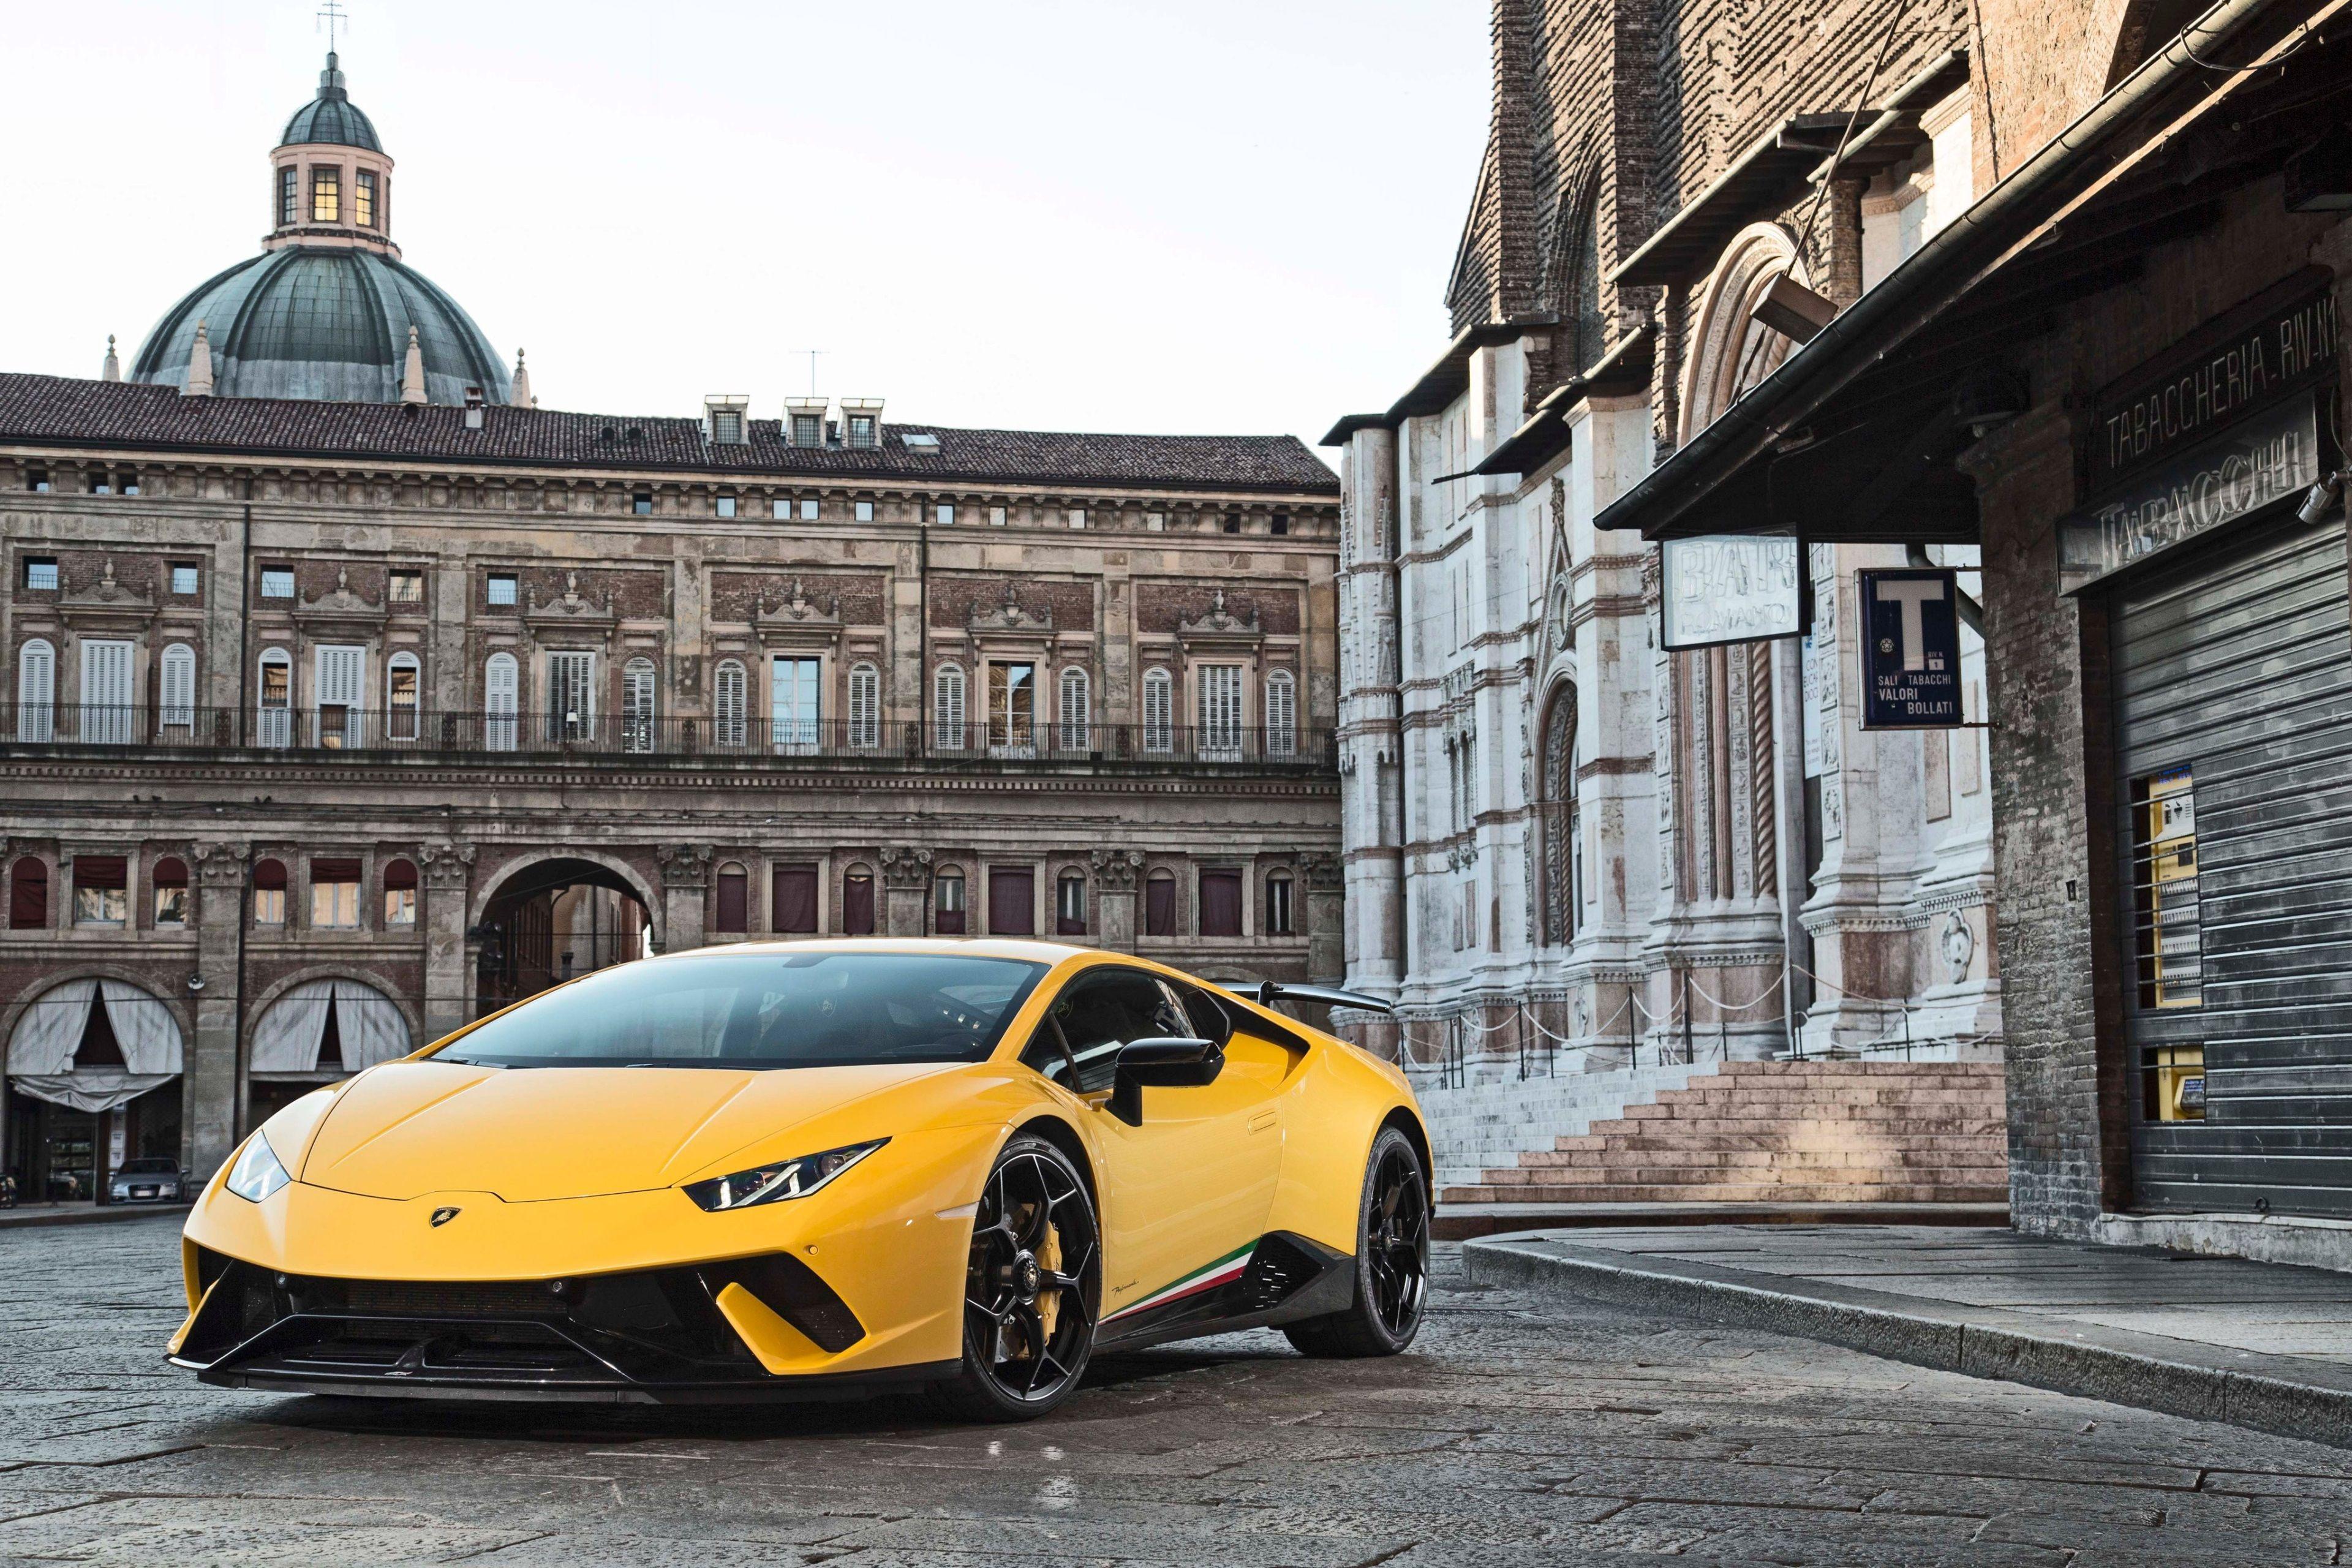 3840x2560 Lamborghini Huracan Performante 4k Background Image Hd